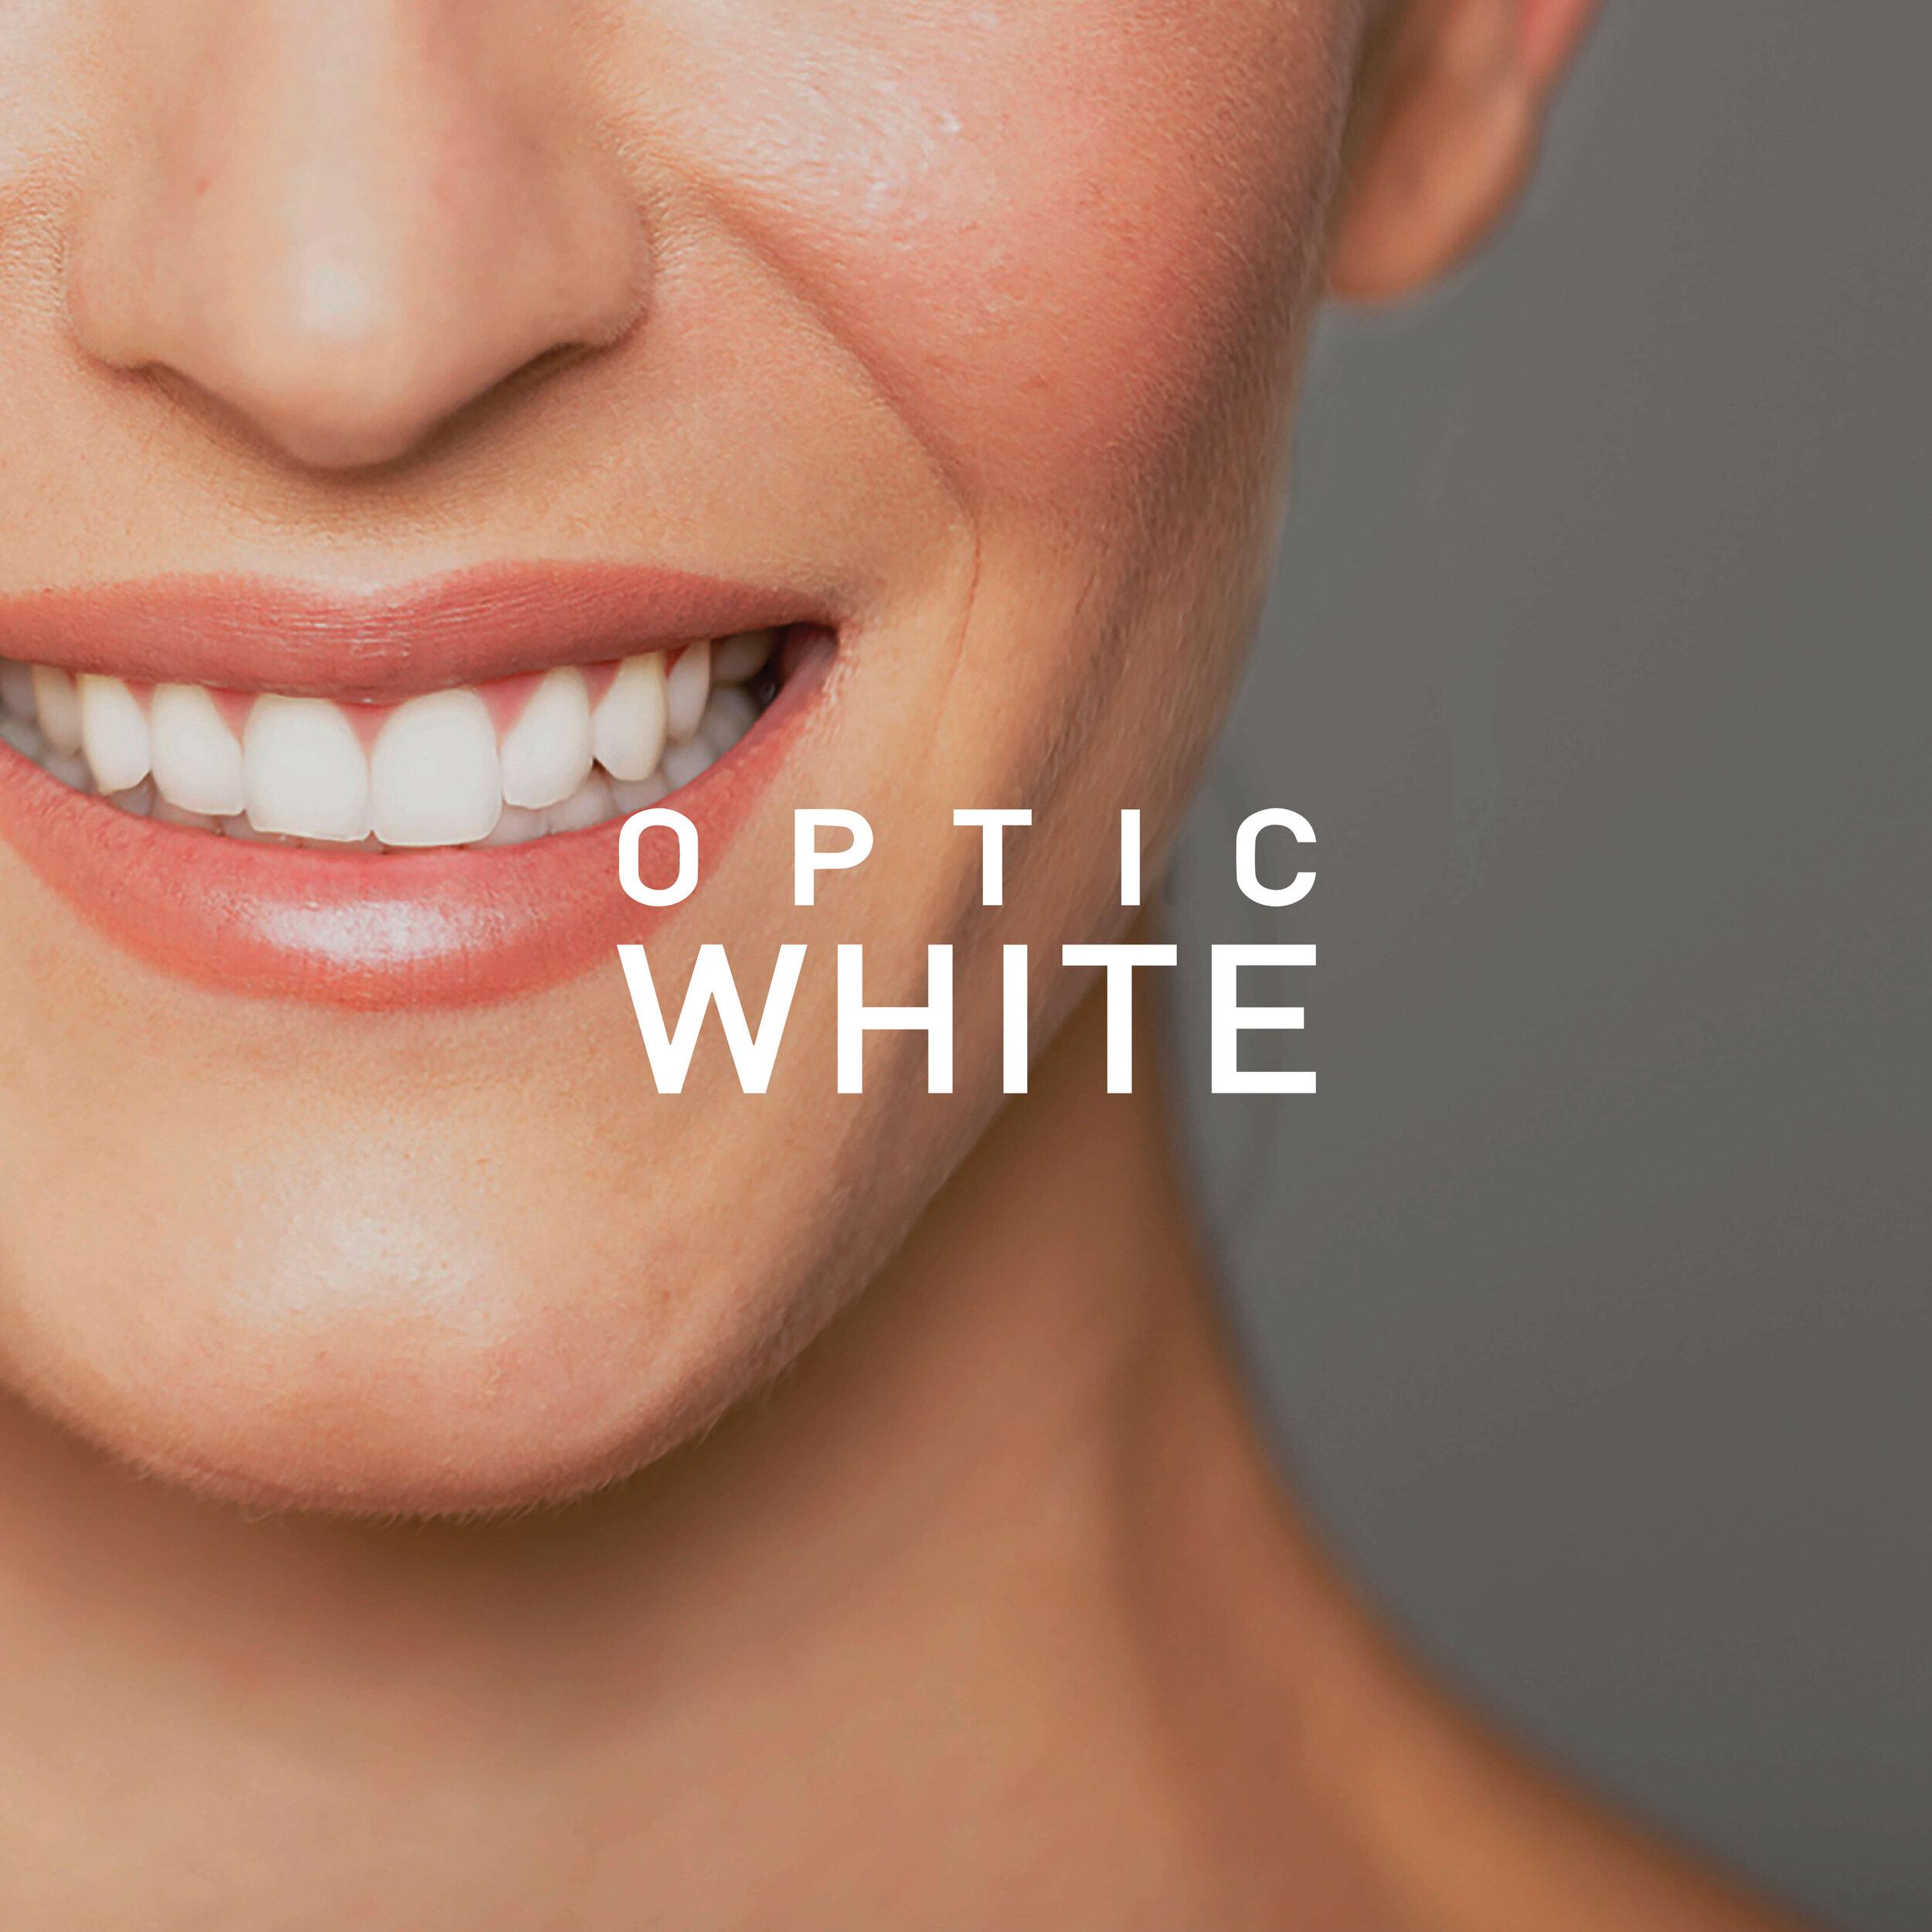 Optic White_Colgate_credential.jpg